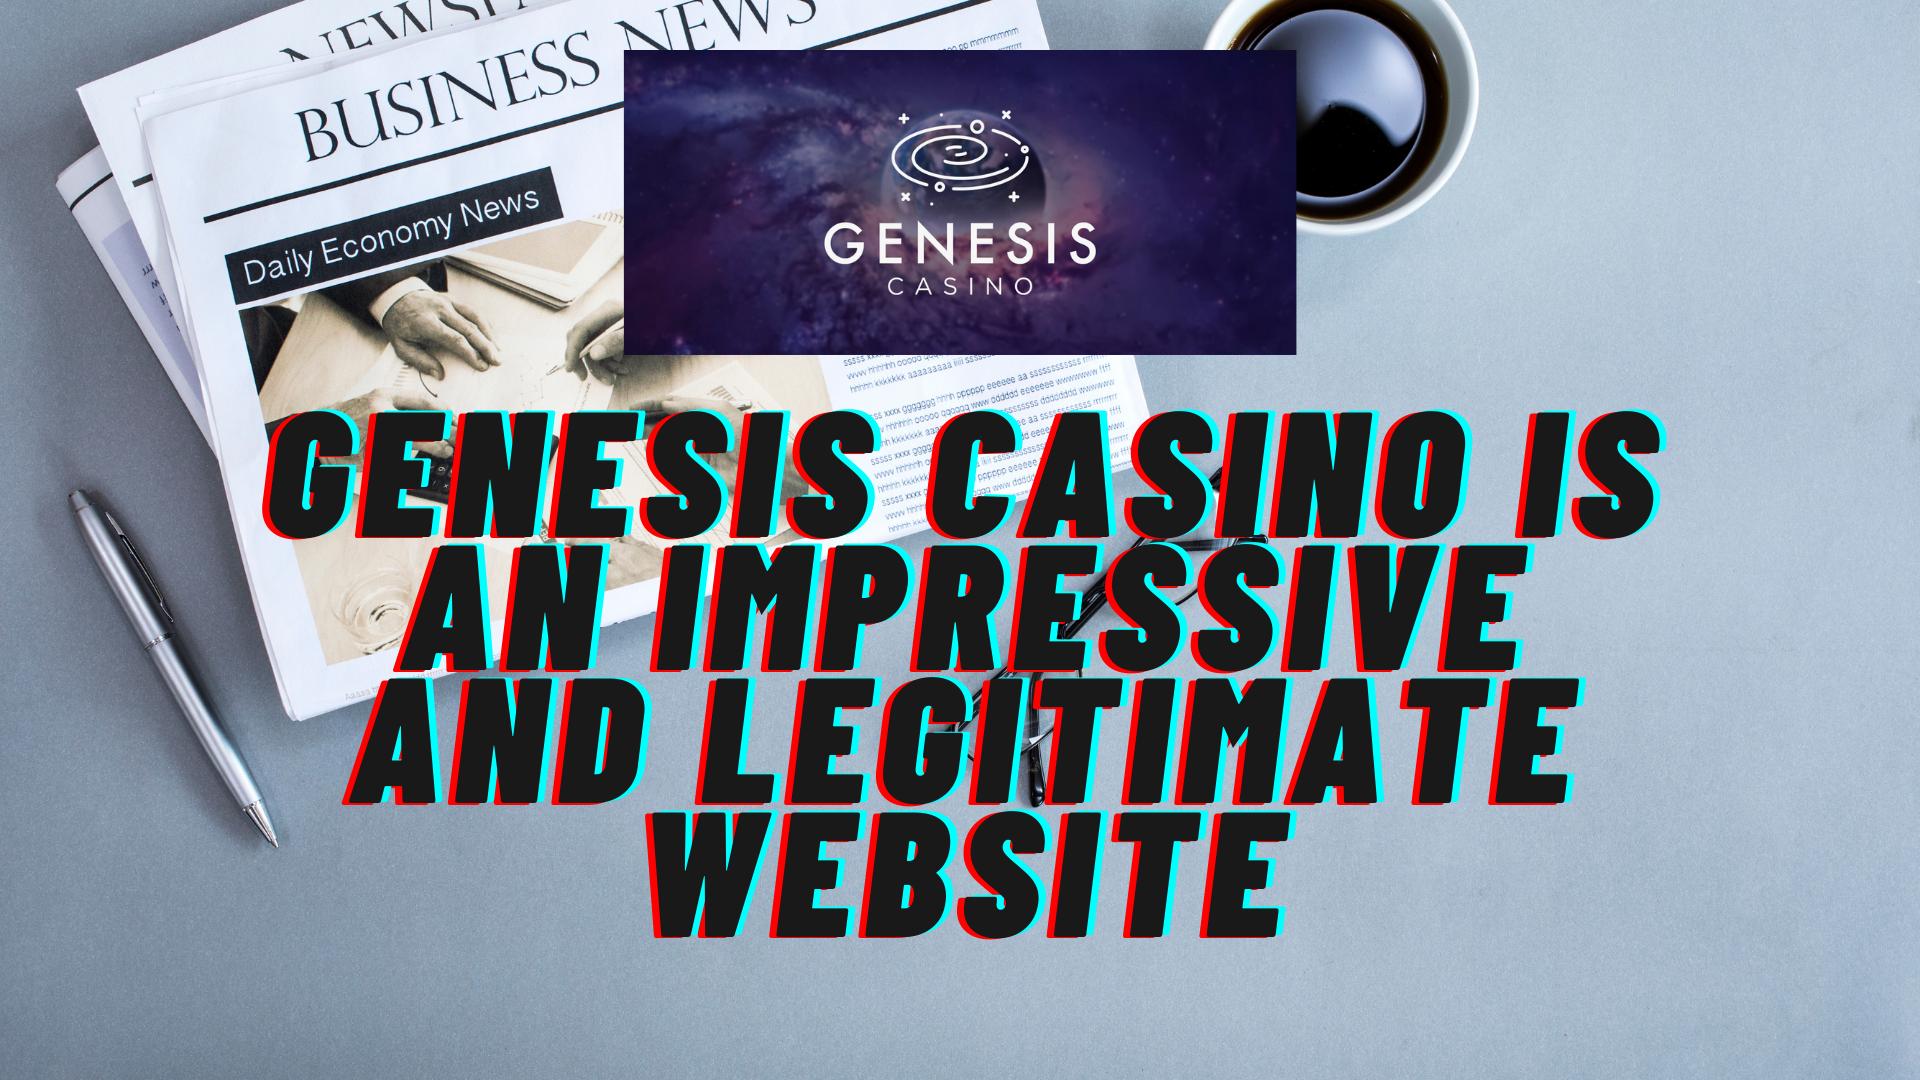 Genesis Casino Website